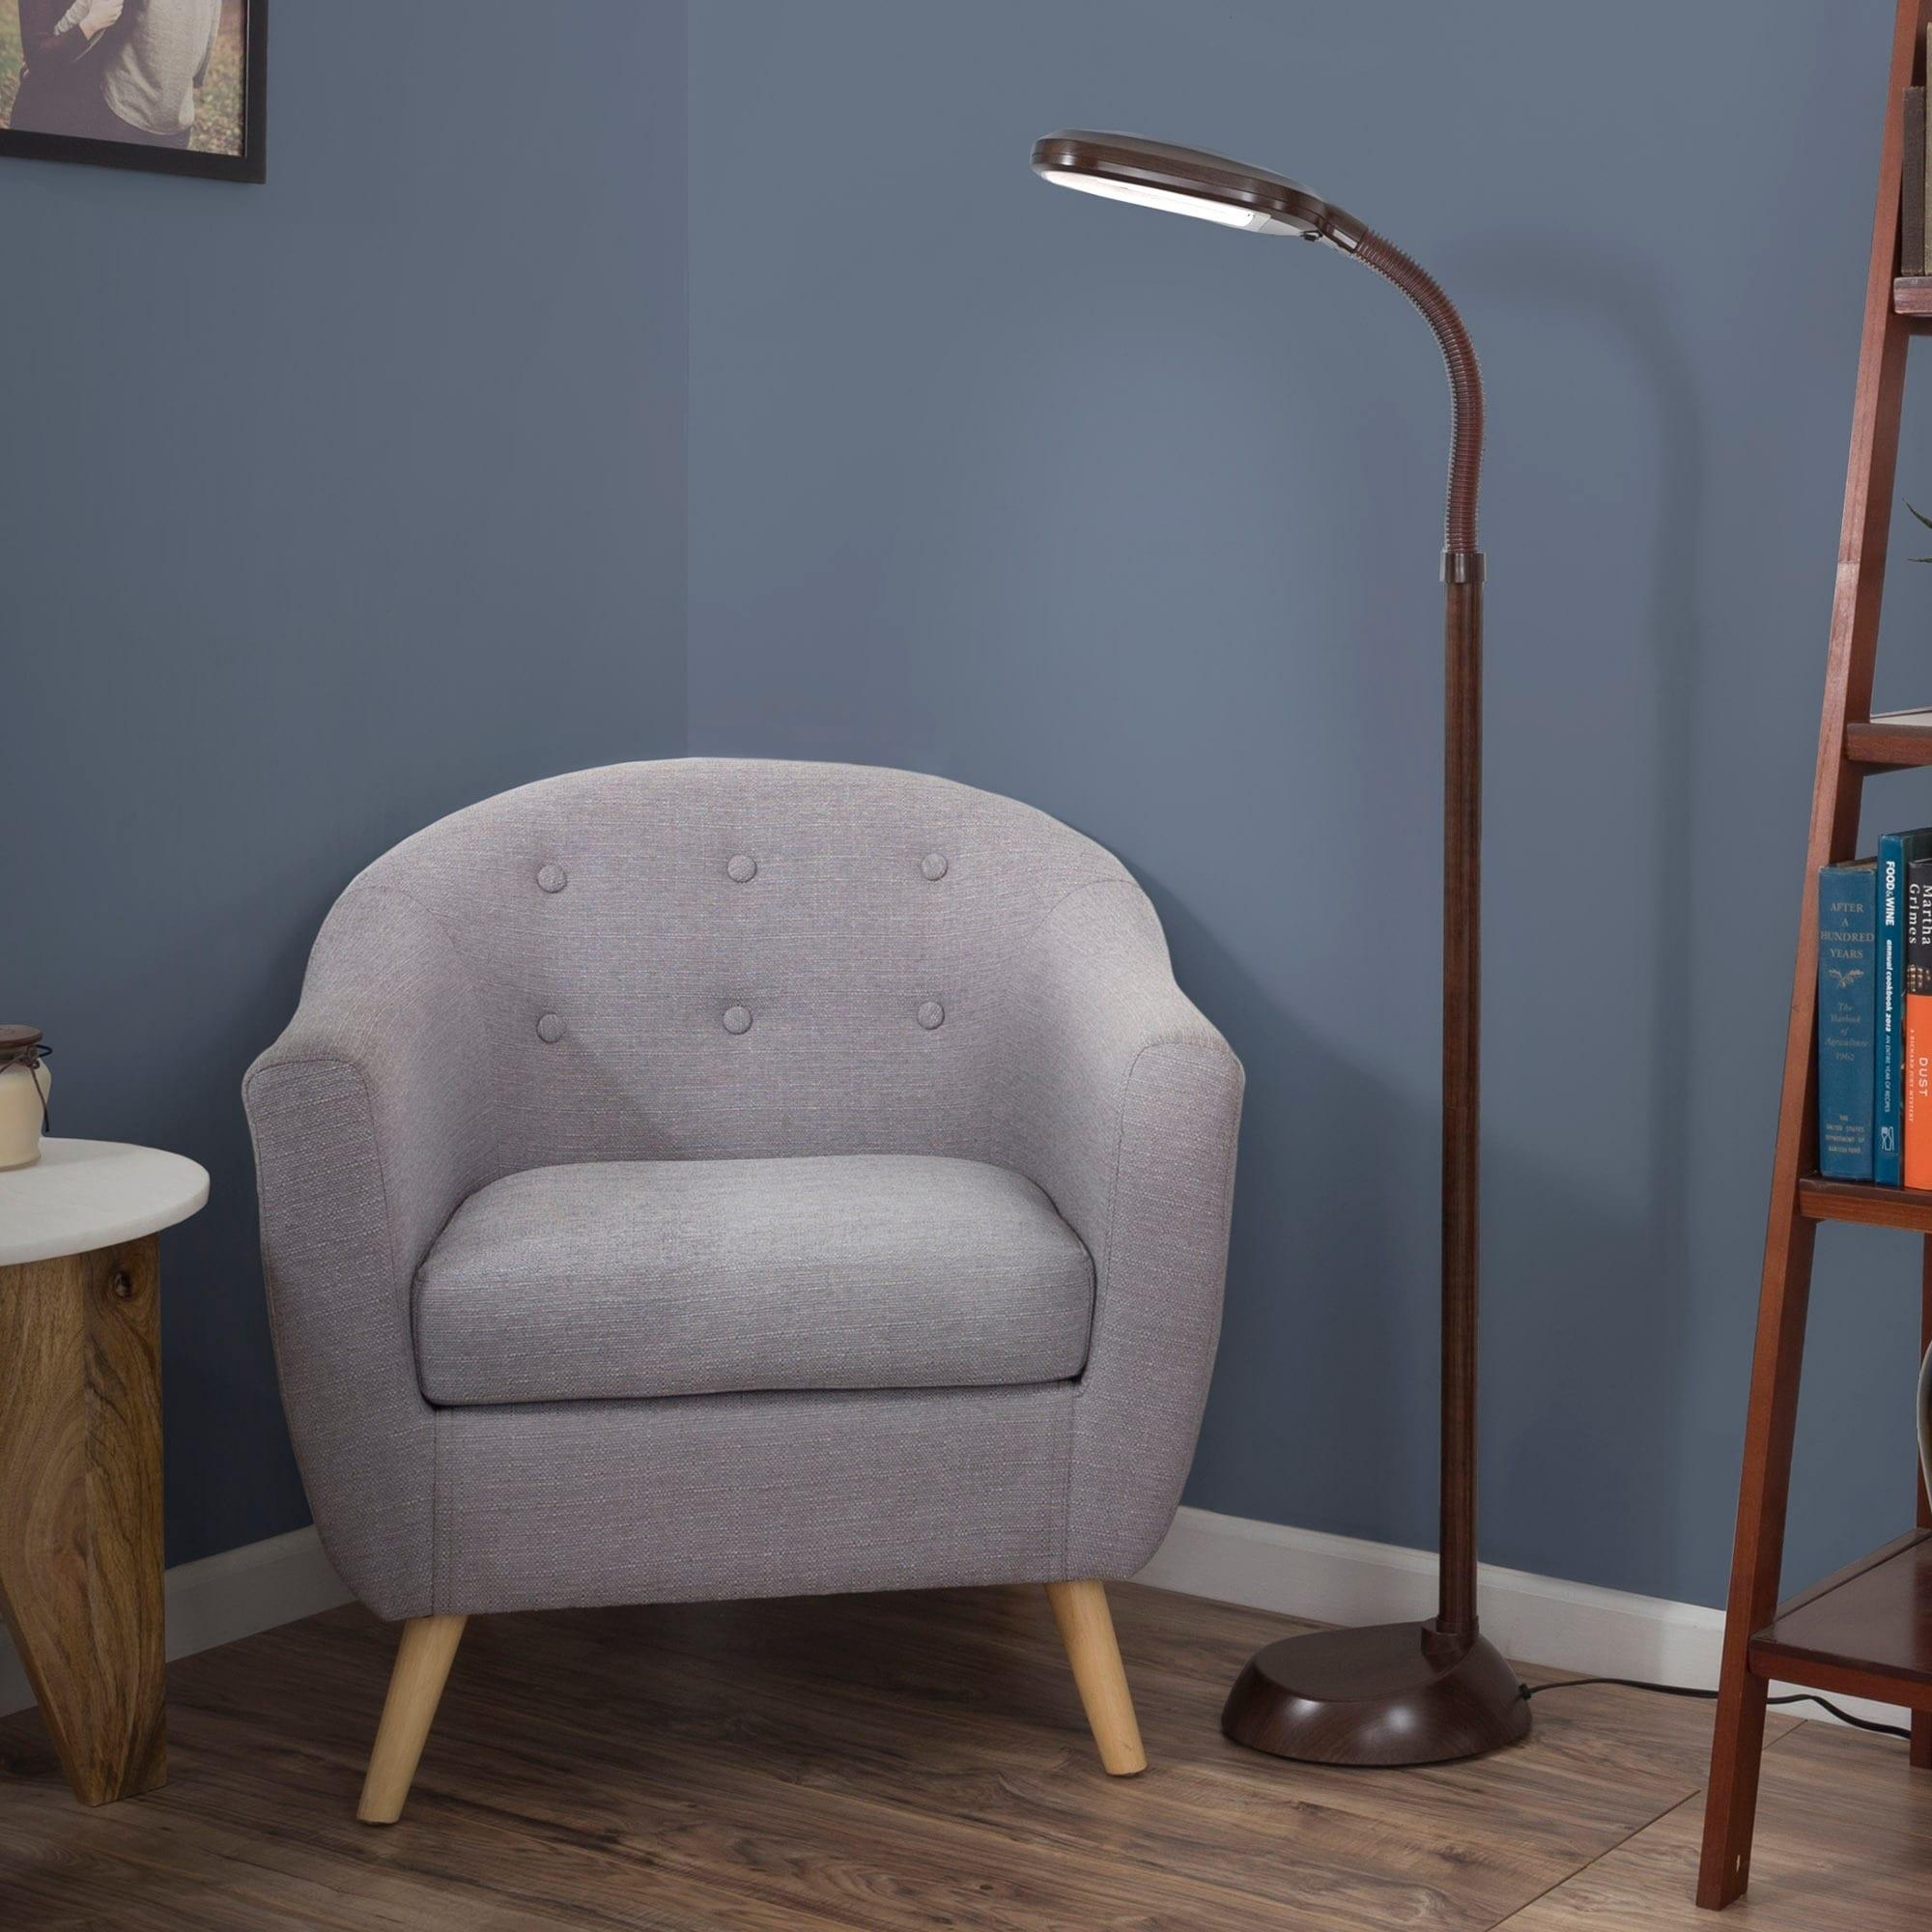 Natural Full Spectrum Sunlight Therapy Reading Floor Lamp...